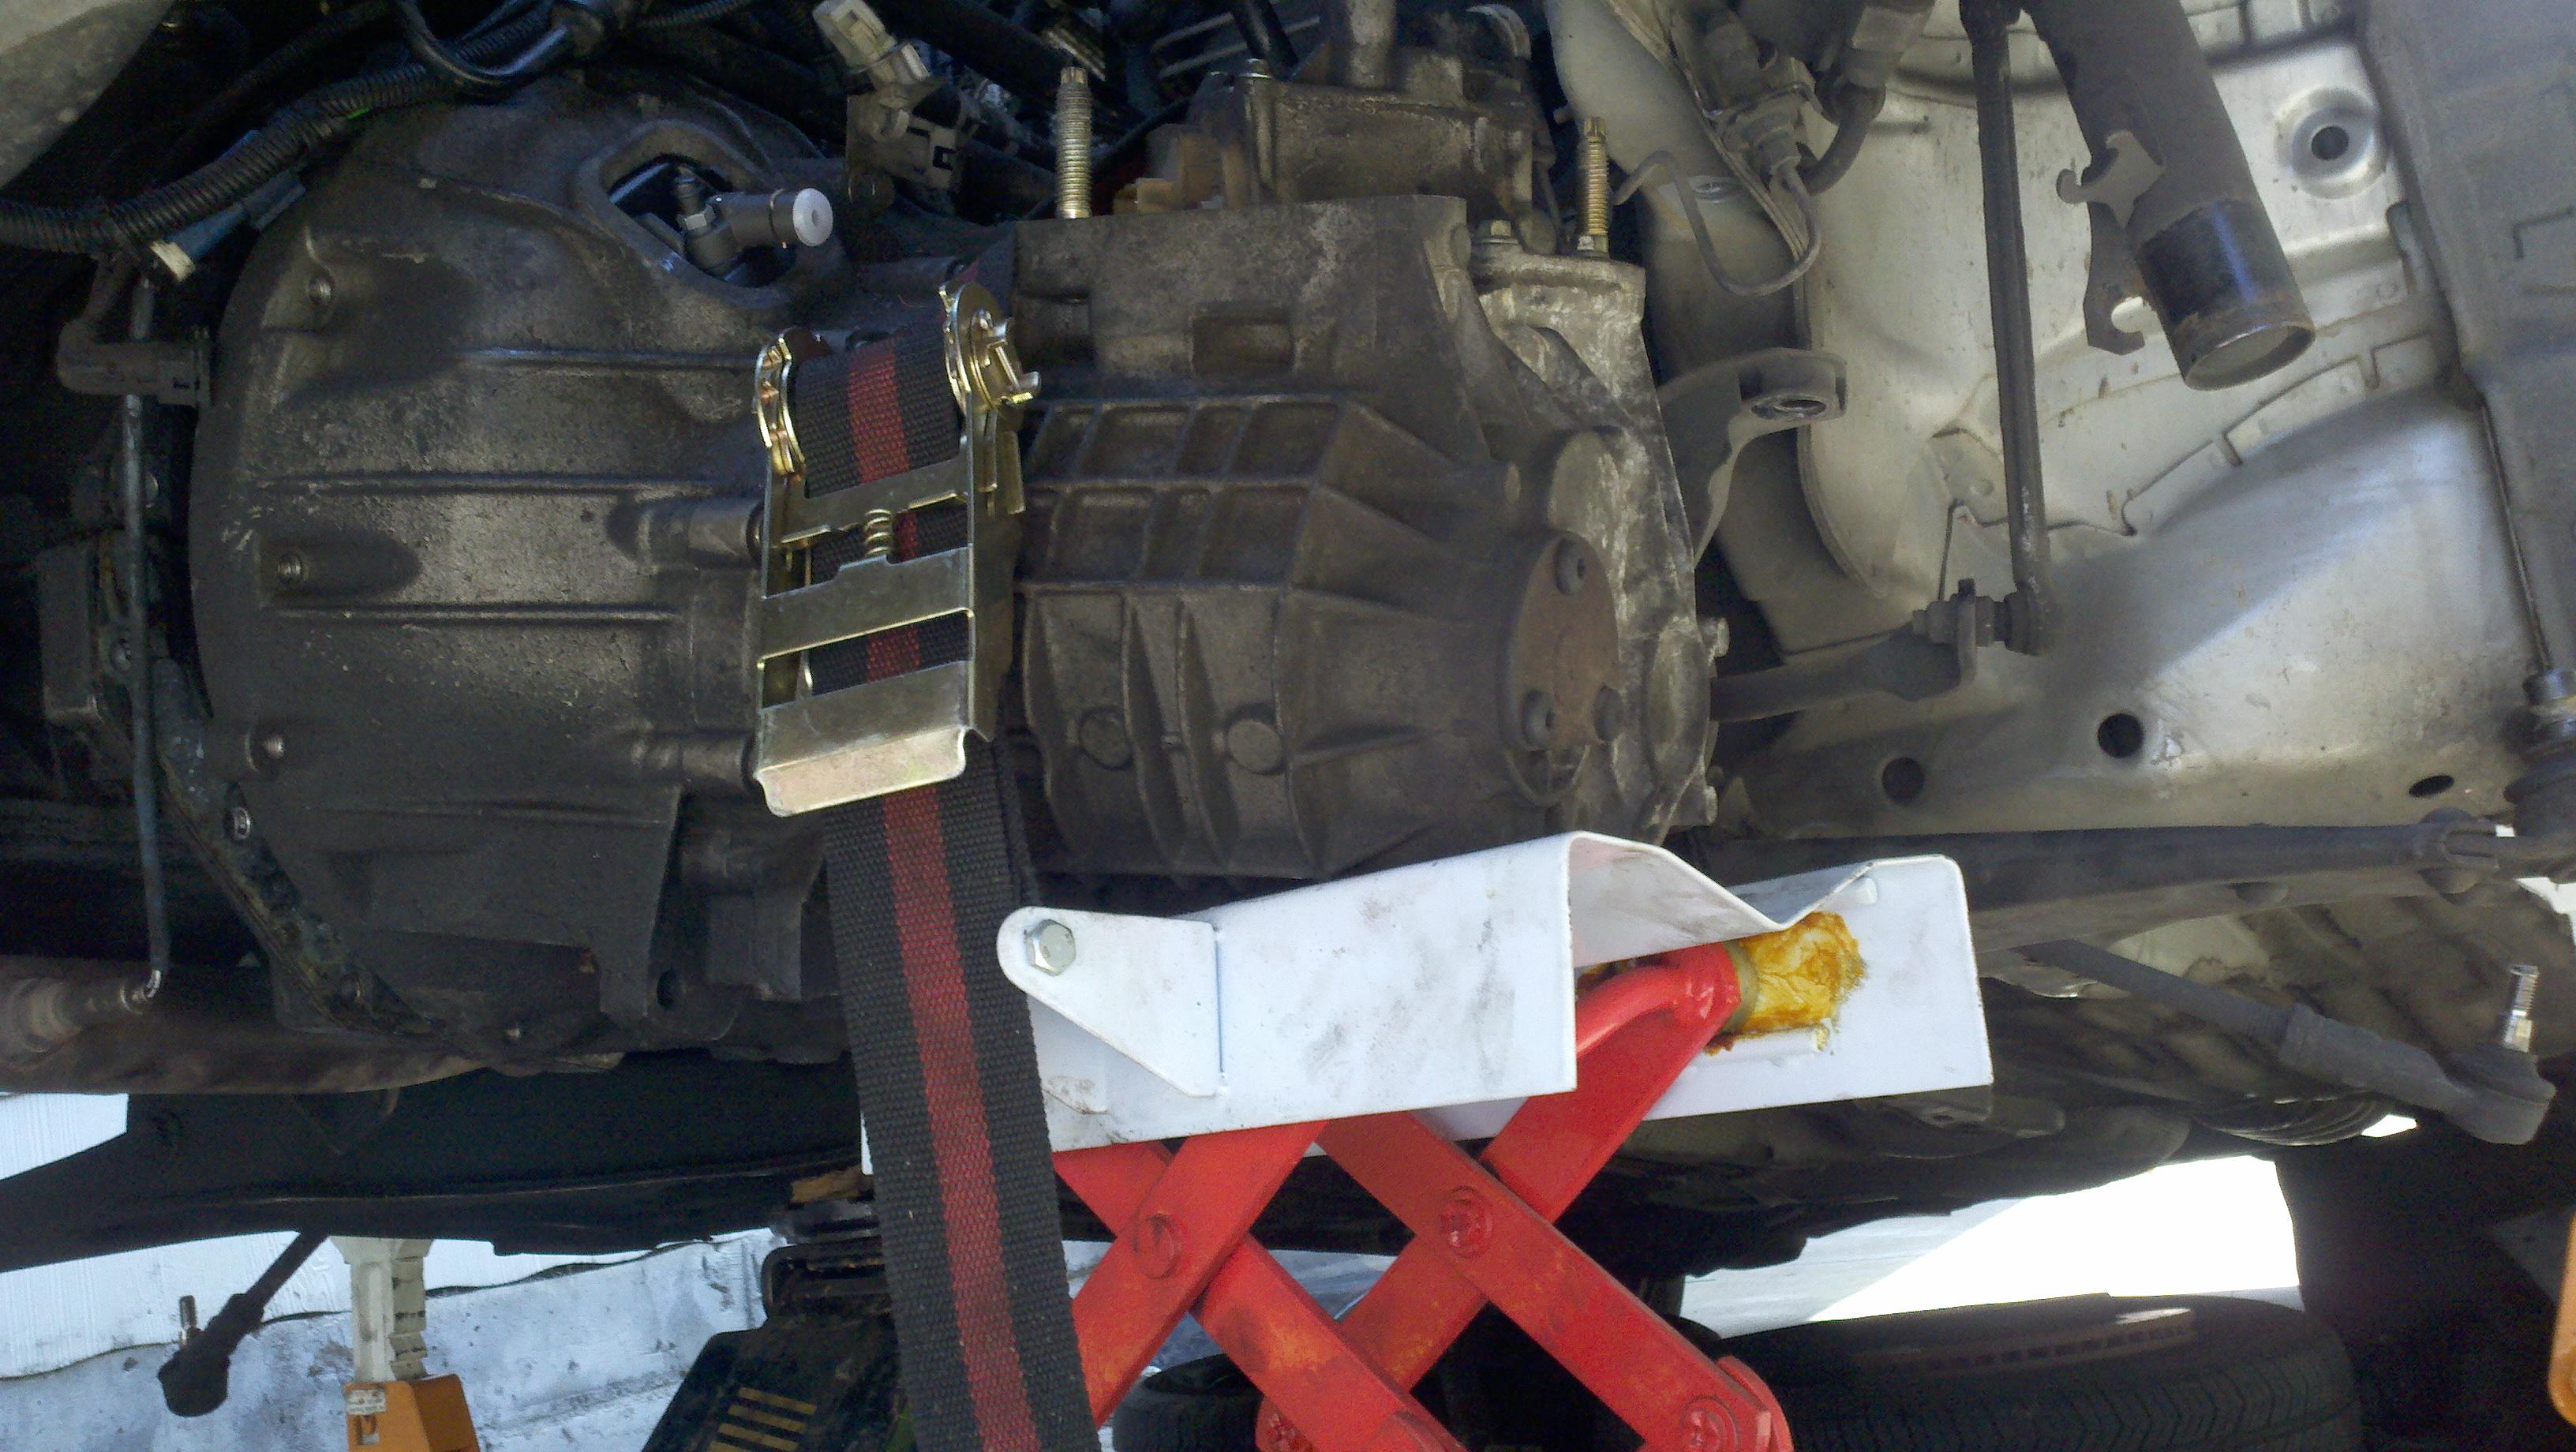 2002 Ford Focus Manual Transmission Fluid Change